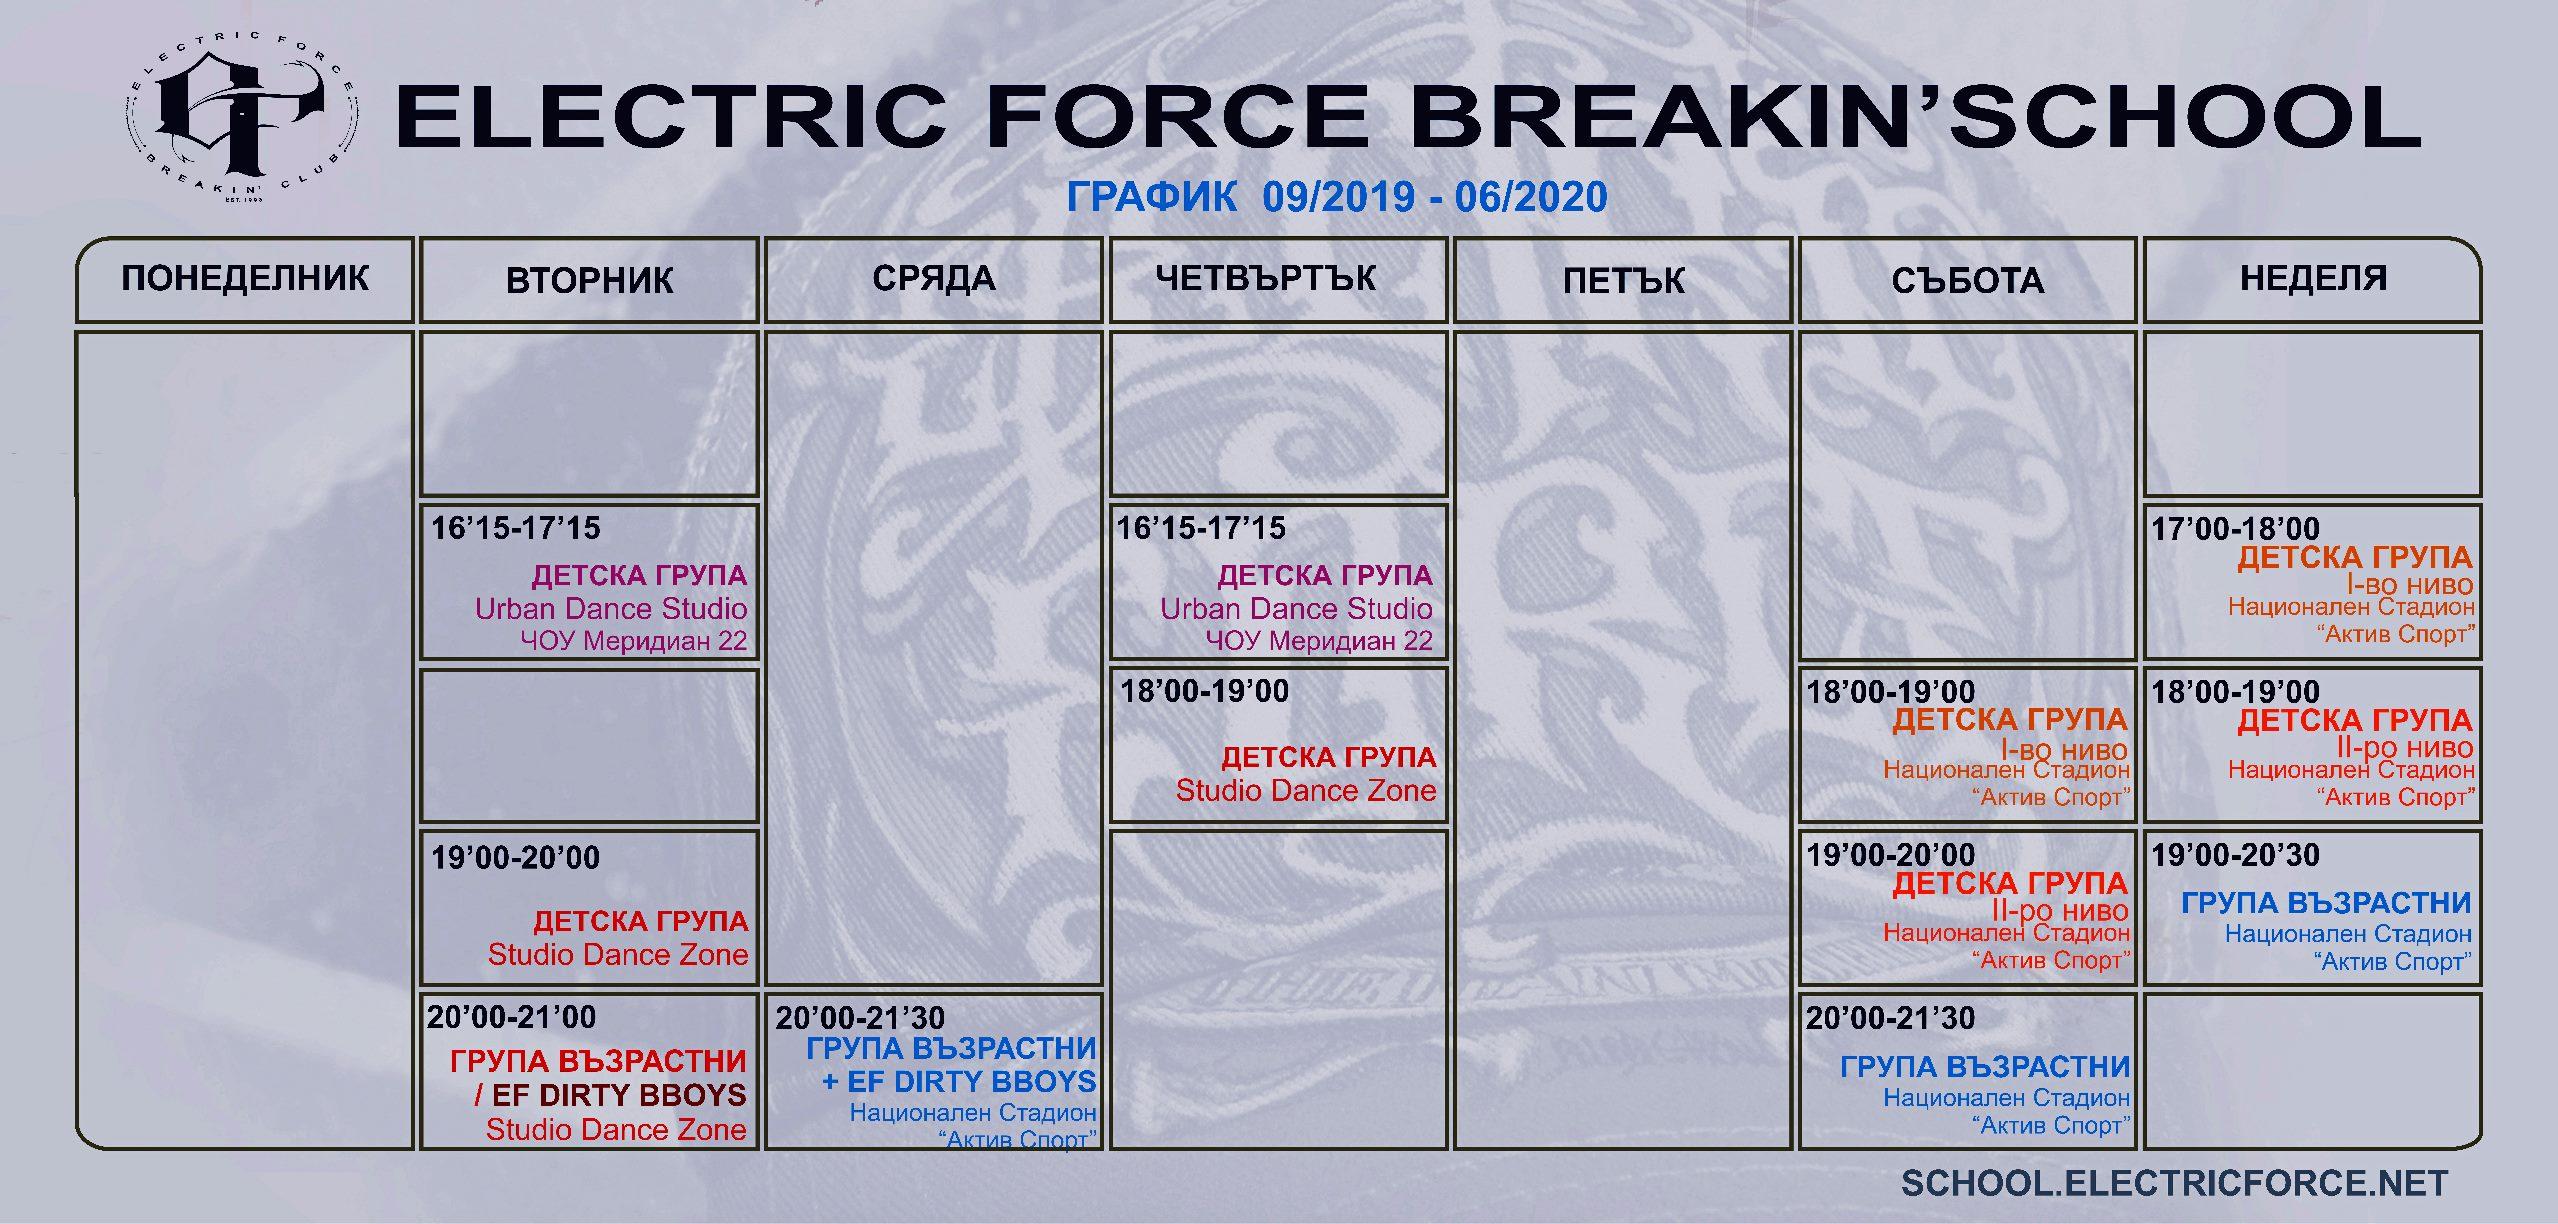 Schedule_09_2019_06_2020N